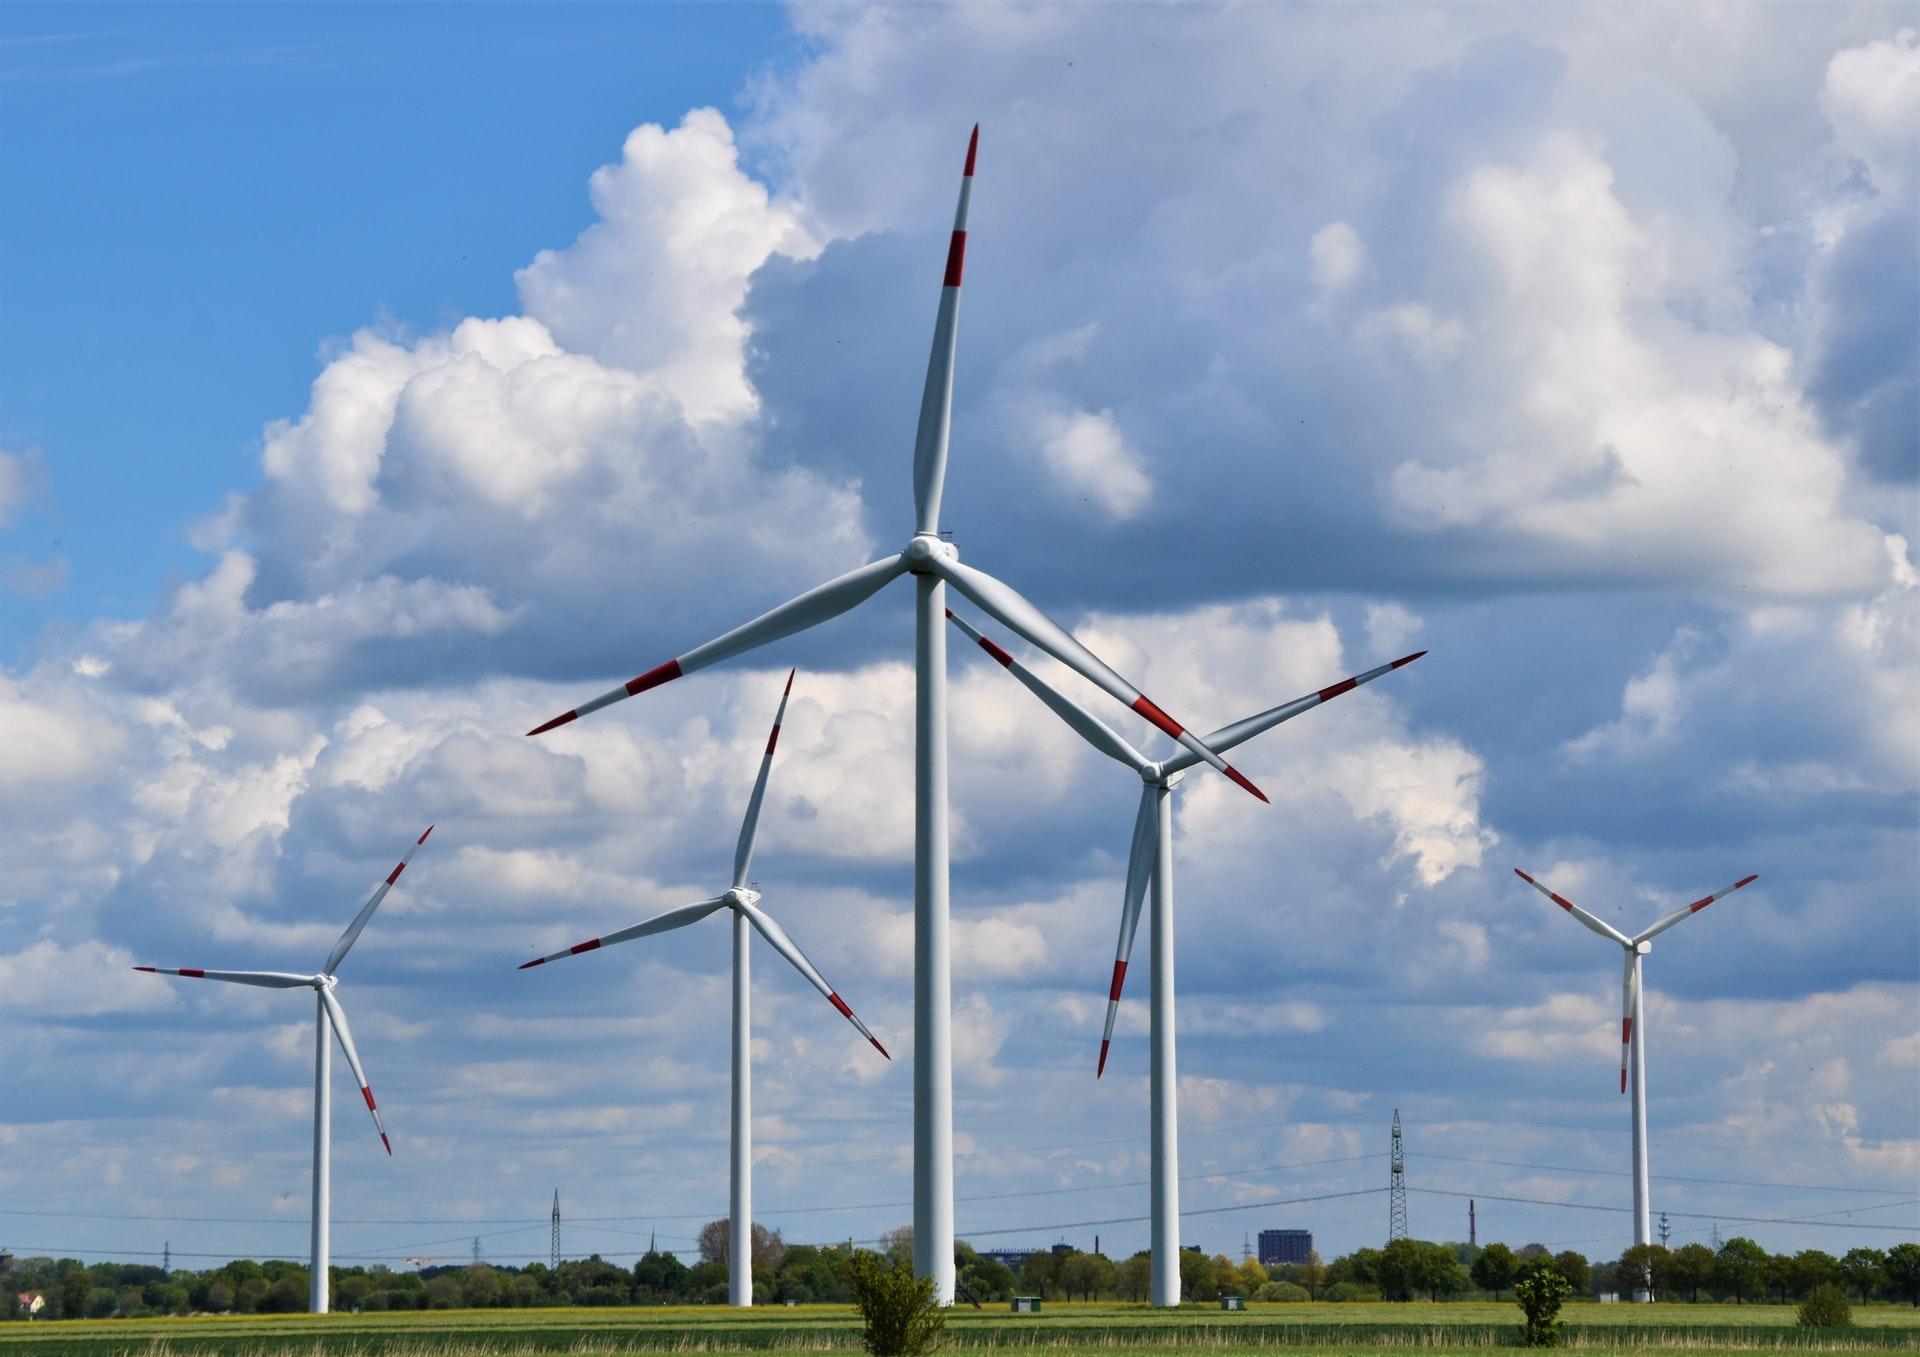 International - Wind turbines - circular economy